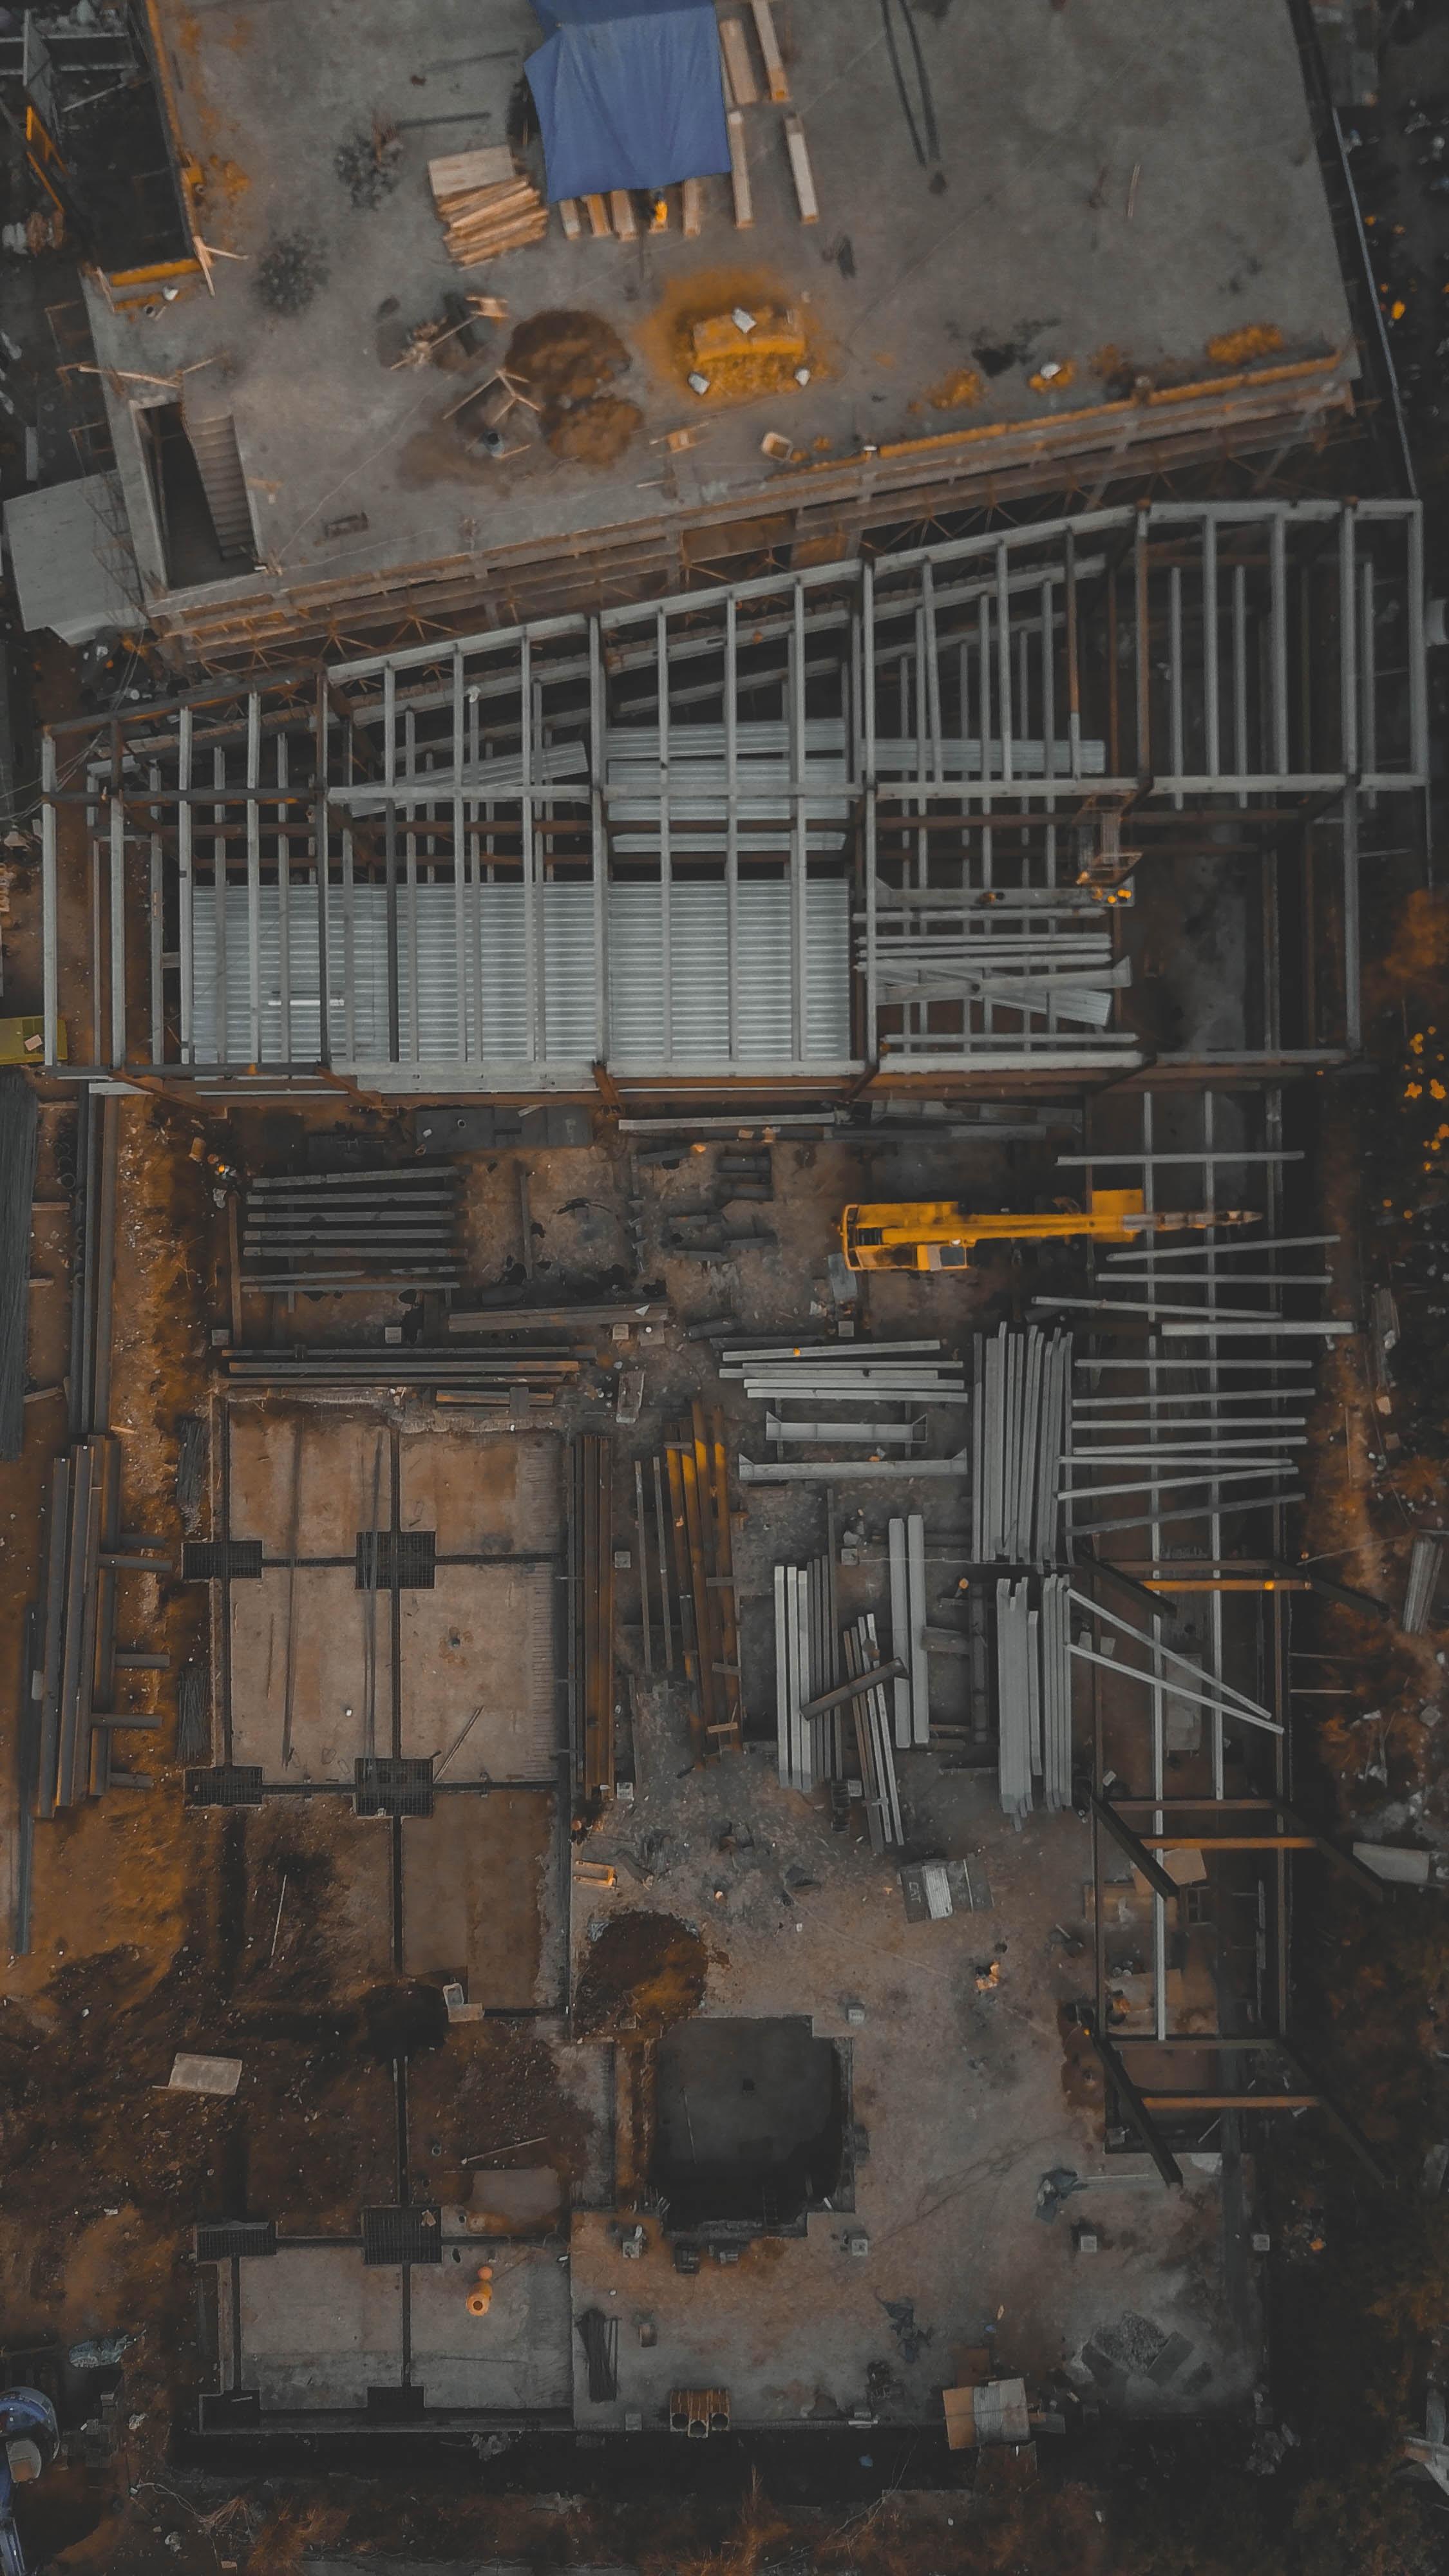 top view of gray steel brackets